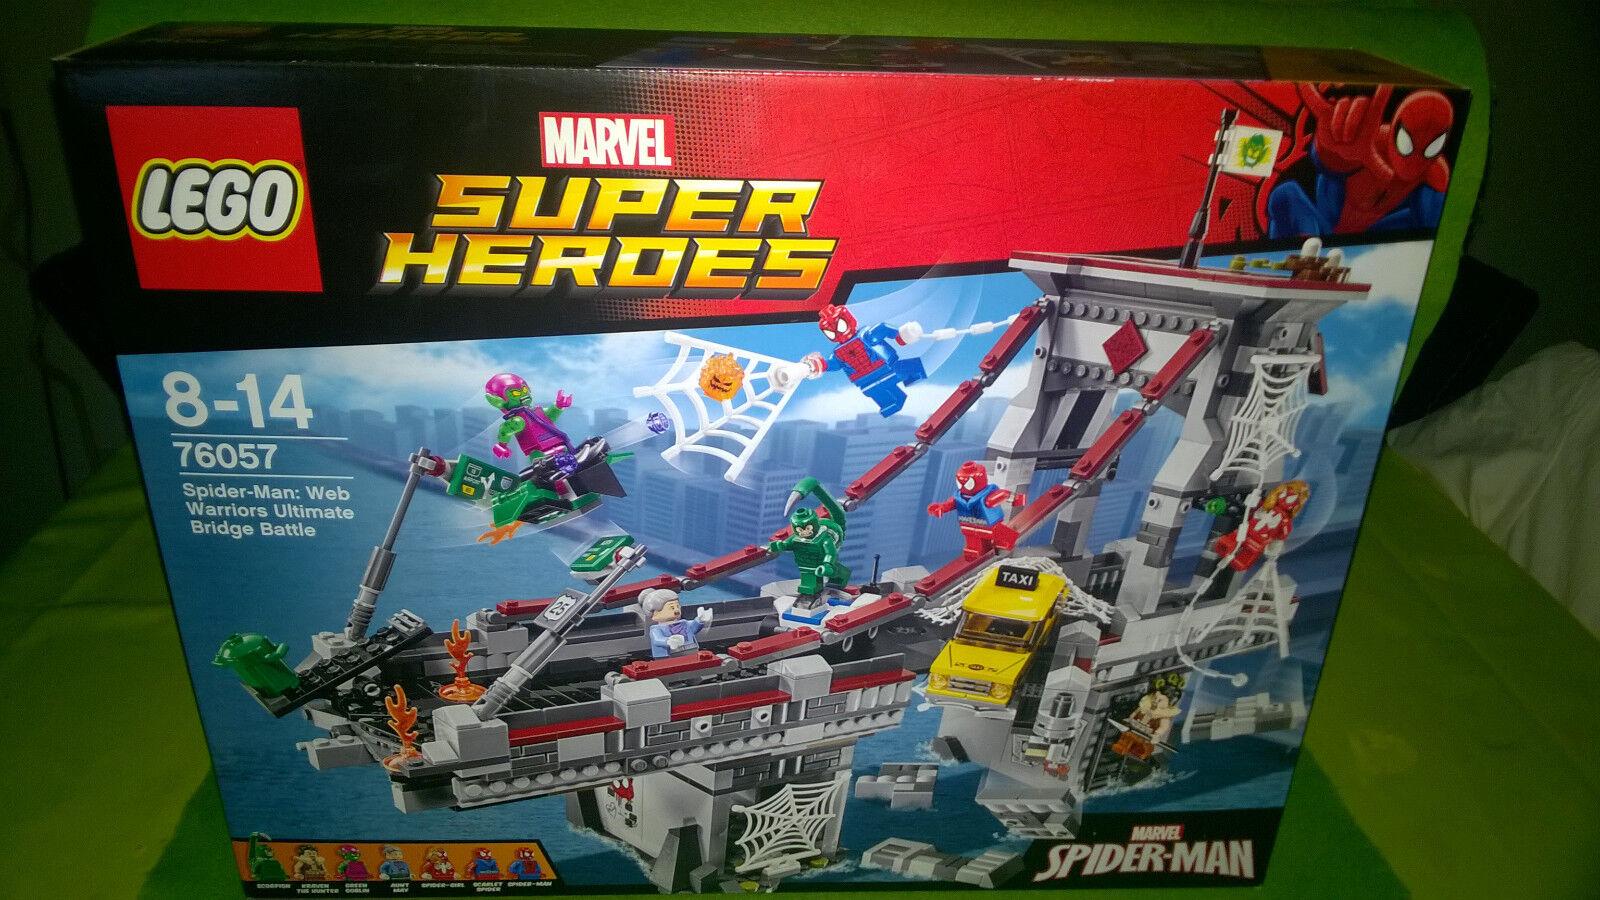 Lego 76057 Marvel Super Heroes Spider-Man  Web Warriors Ultimate battle Bridge